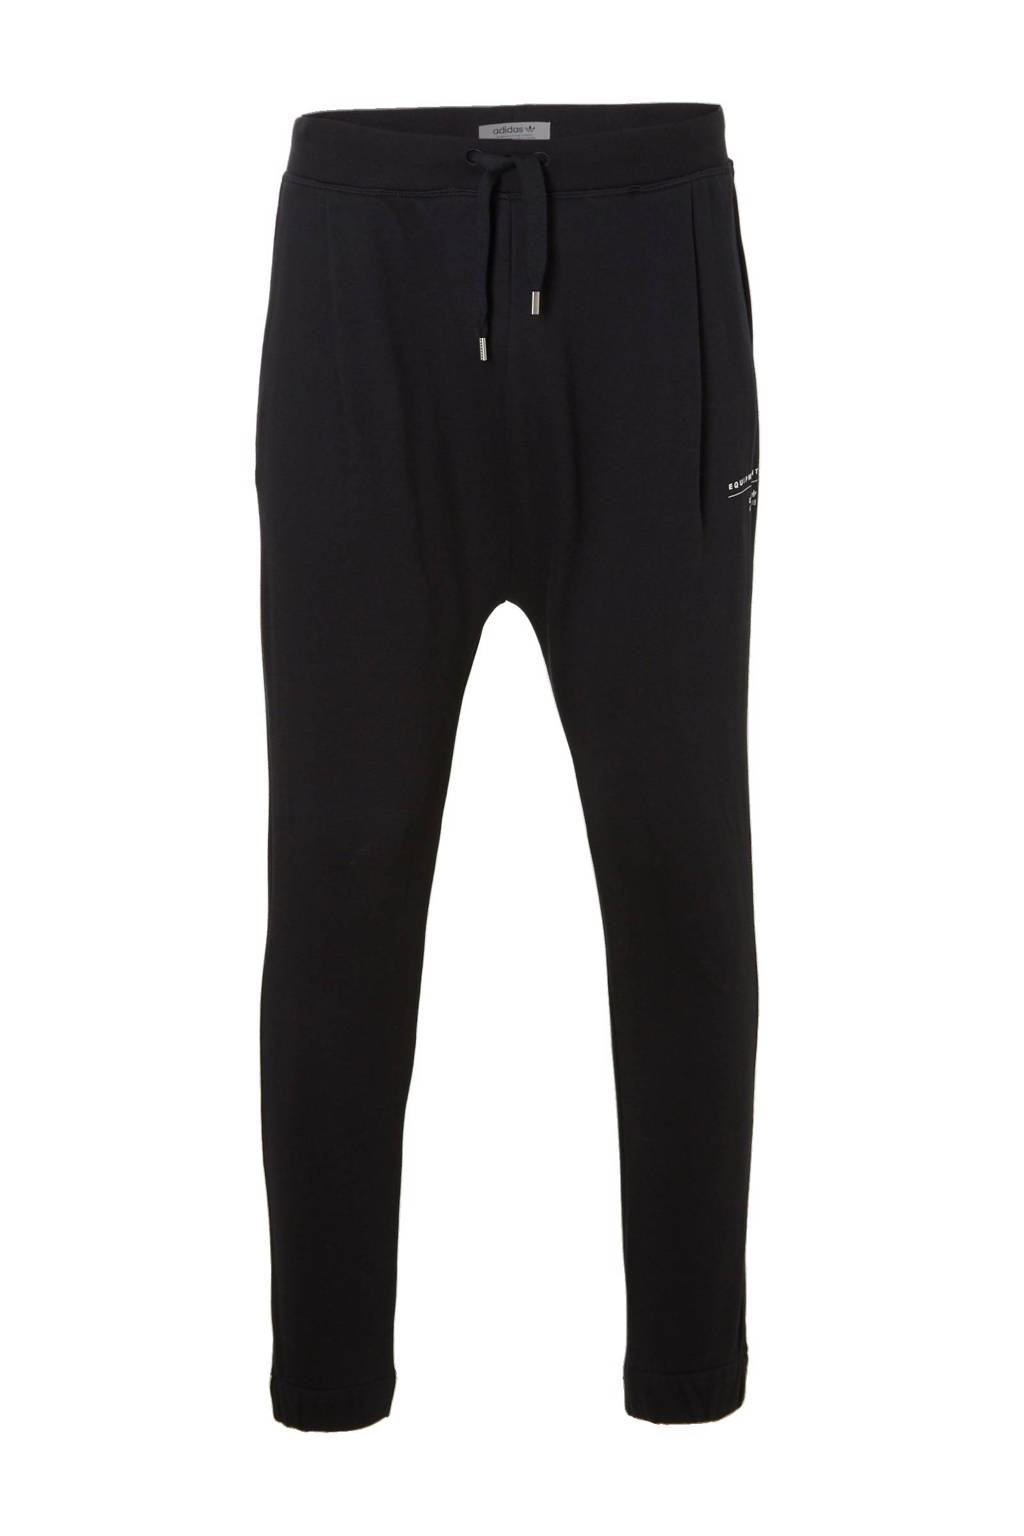 Baggy Joggingbroek.Adidas Originals Baggy Joggingbroek Wehkamp